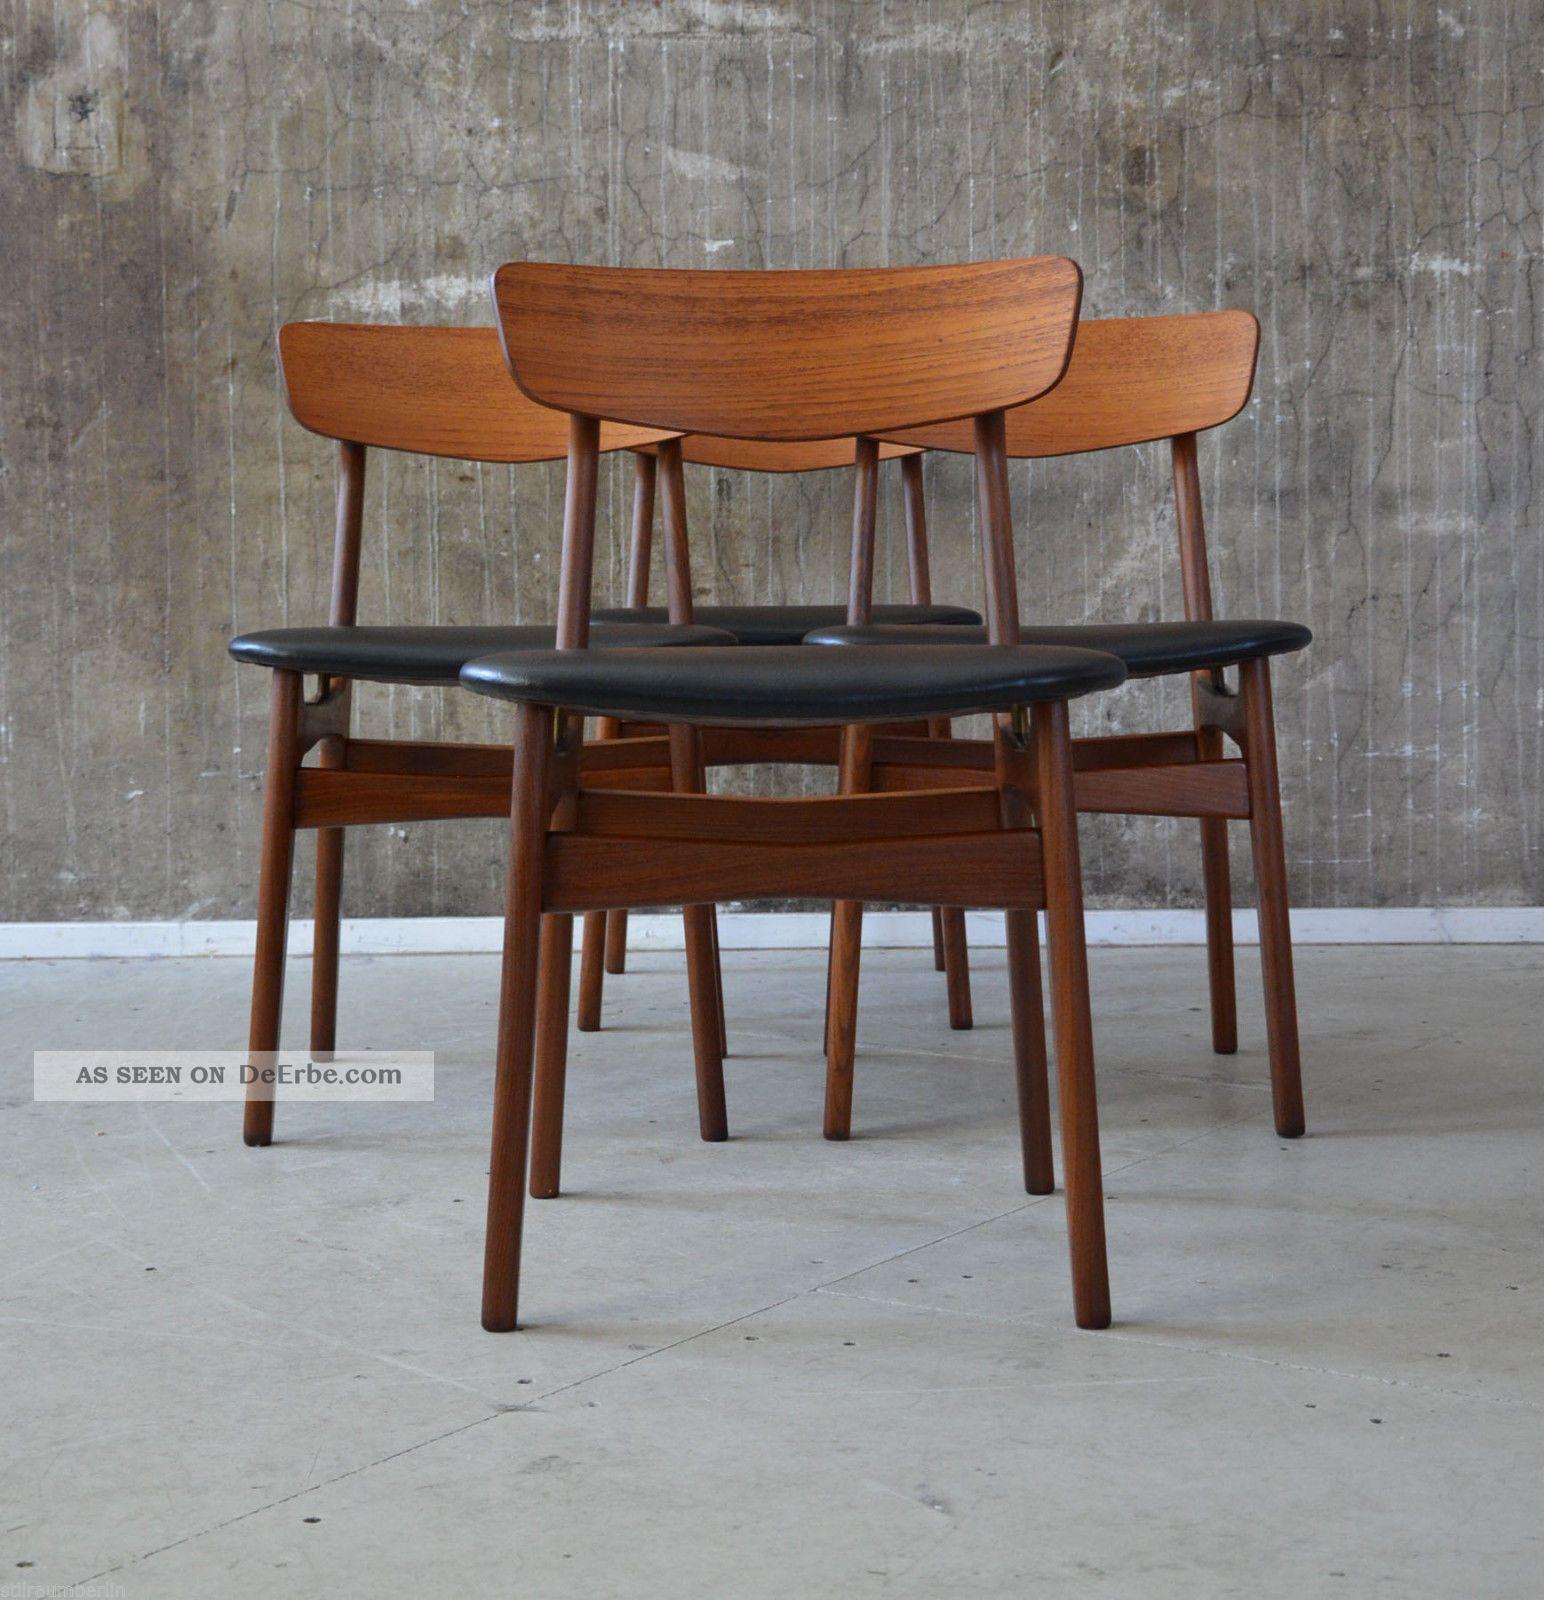 4 x 60er teak st hle esszimmerst hle danish design 60s for Danish design mobel 60er